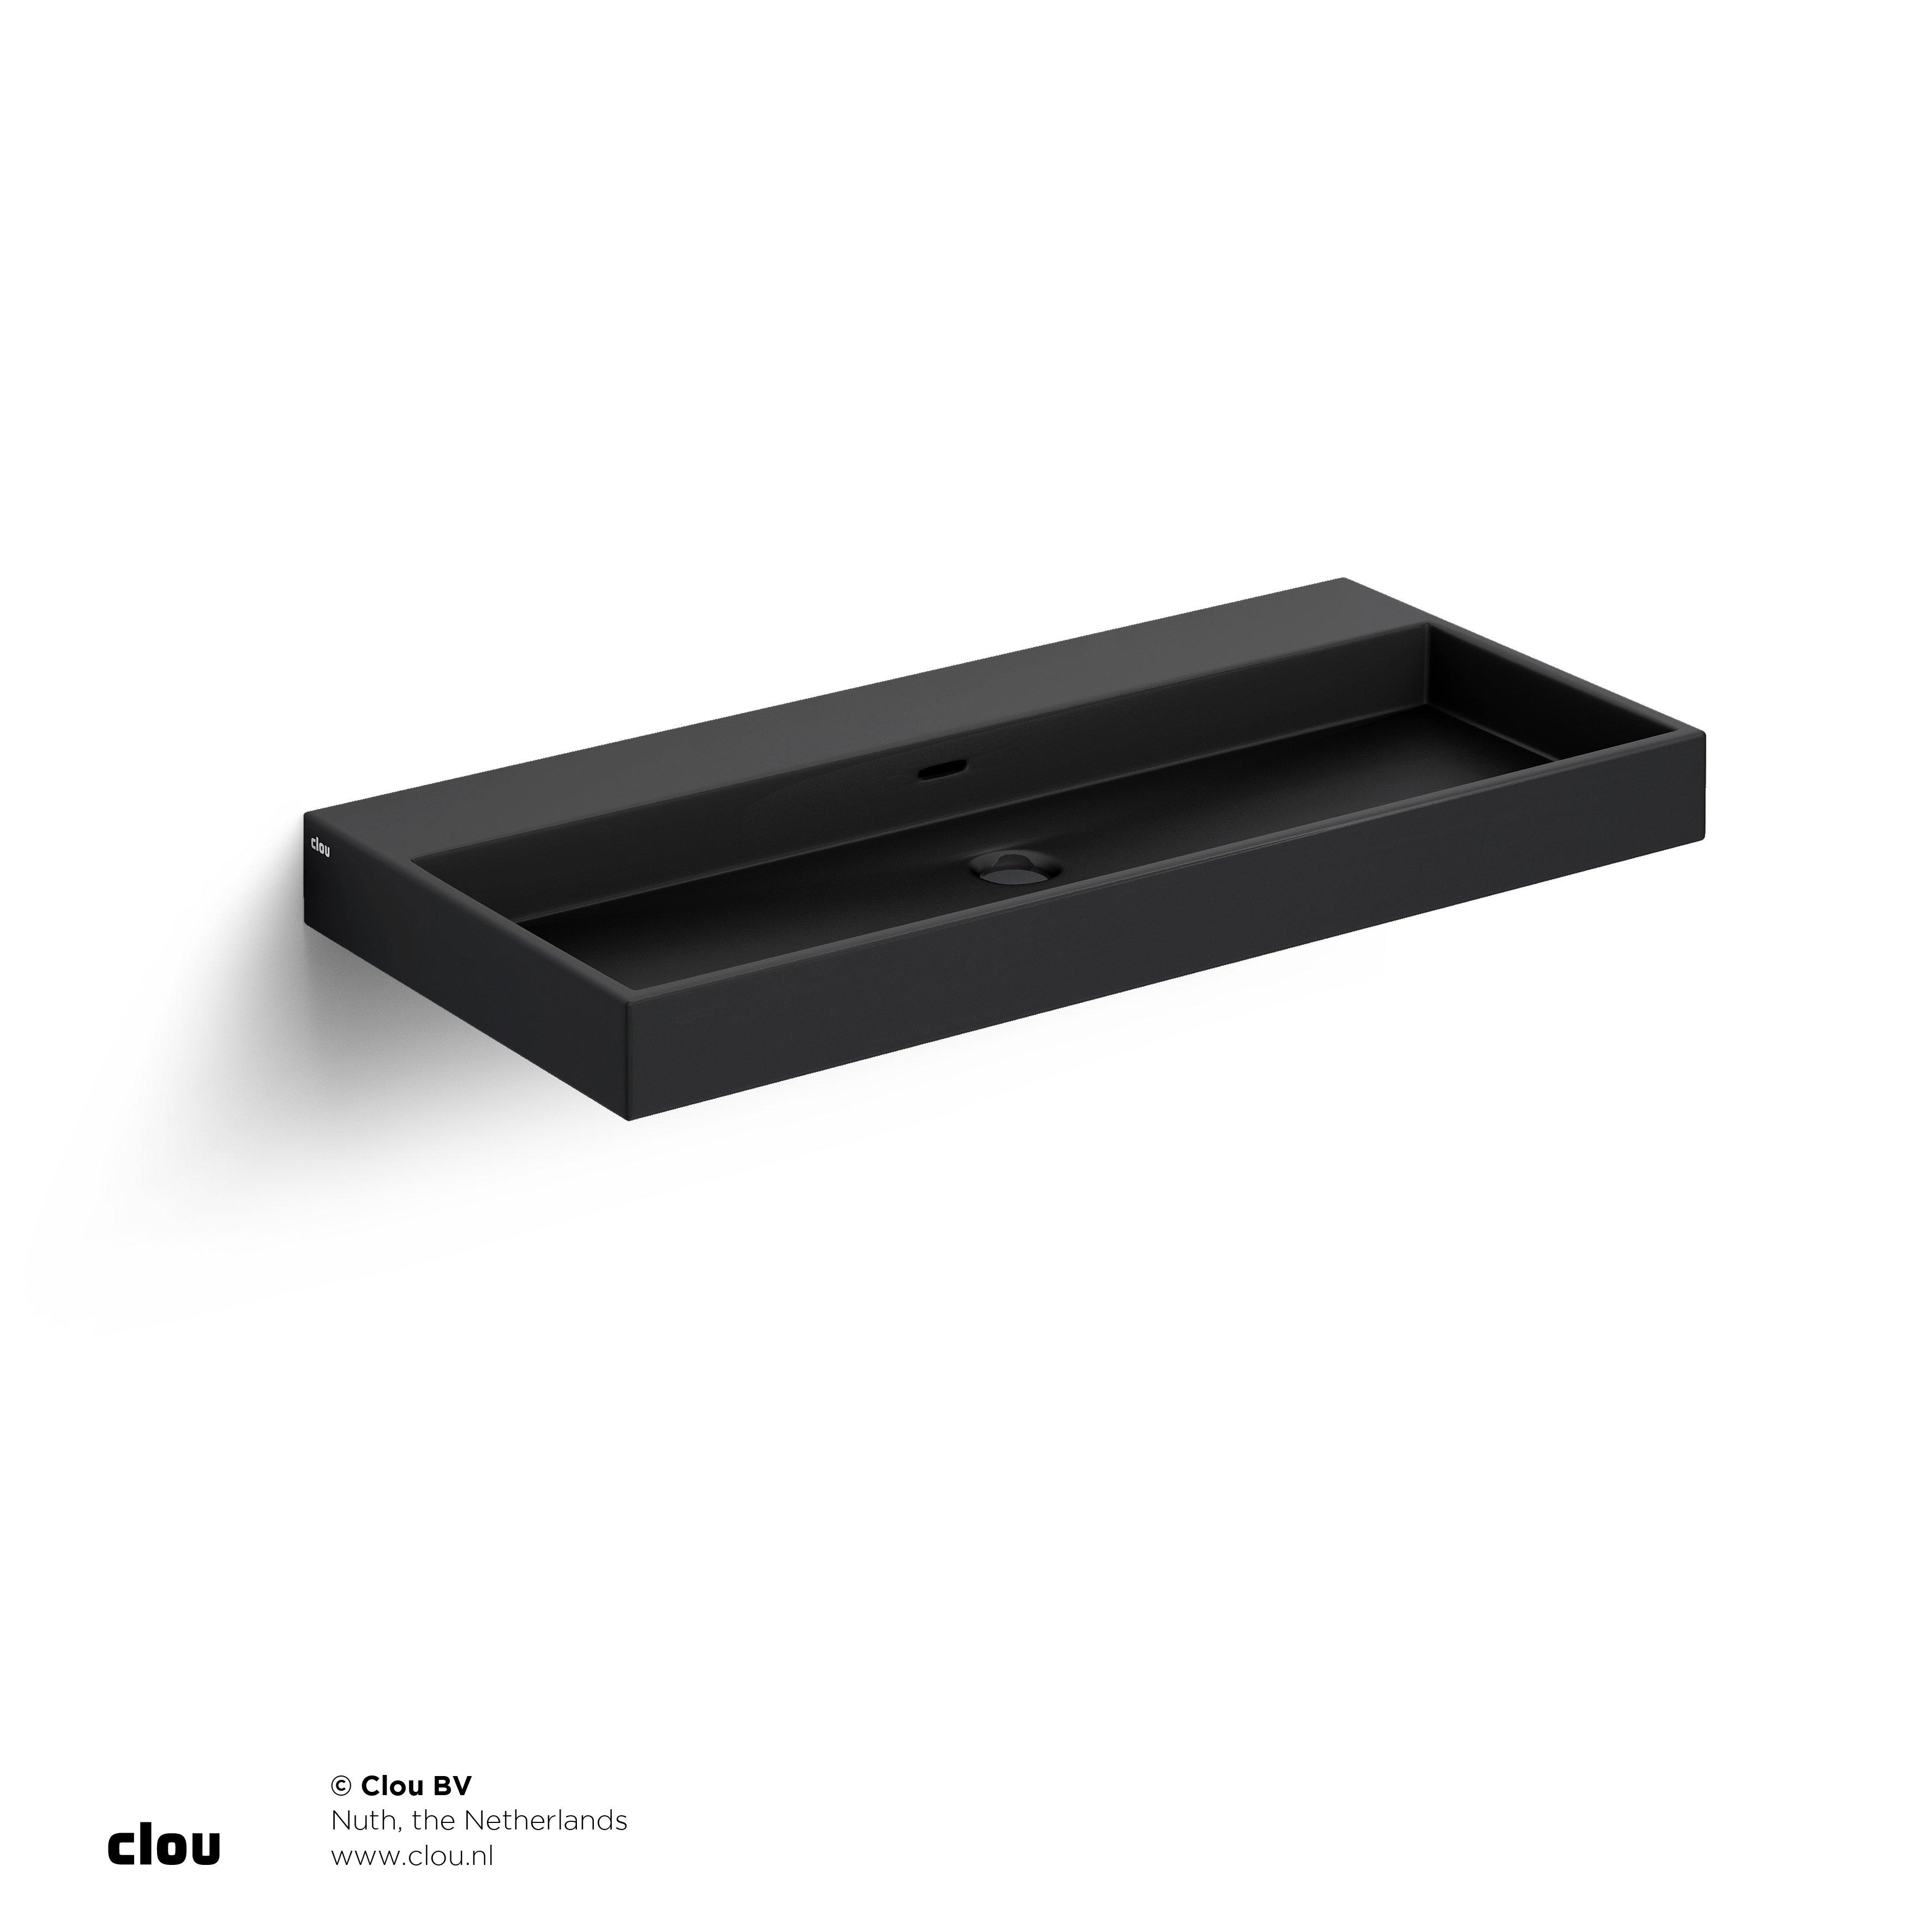 Clou Wash Me wastafel 90cm, zonder plug, mat zwart keramiek